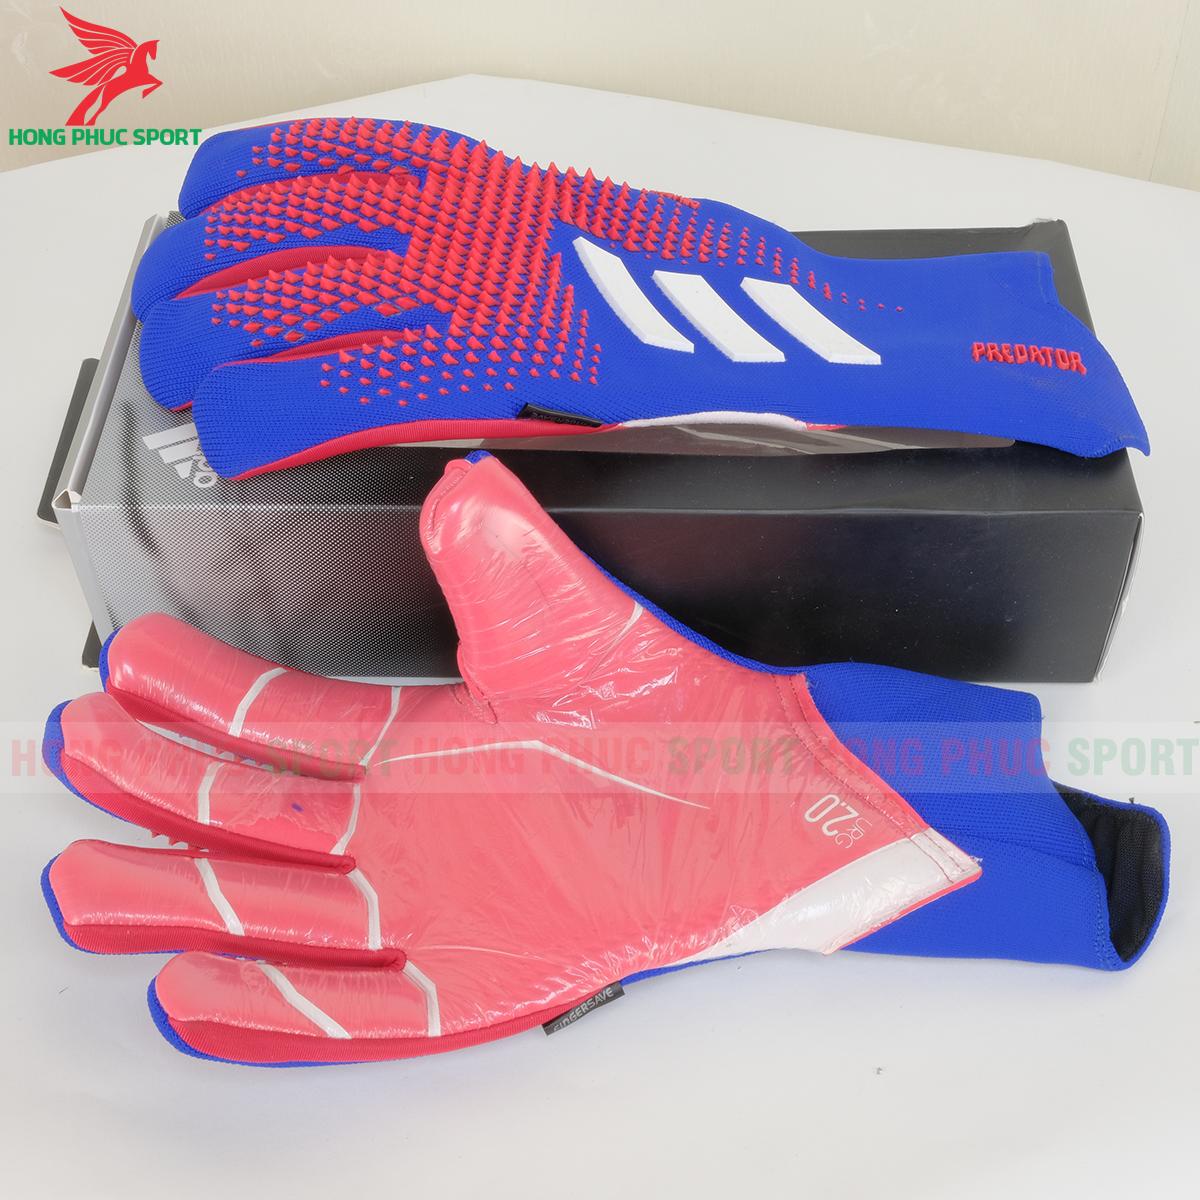 Găng tay Adidas Predator Pro GL Mutator URG 2.0 mẫu 2